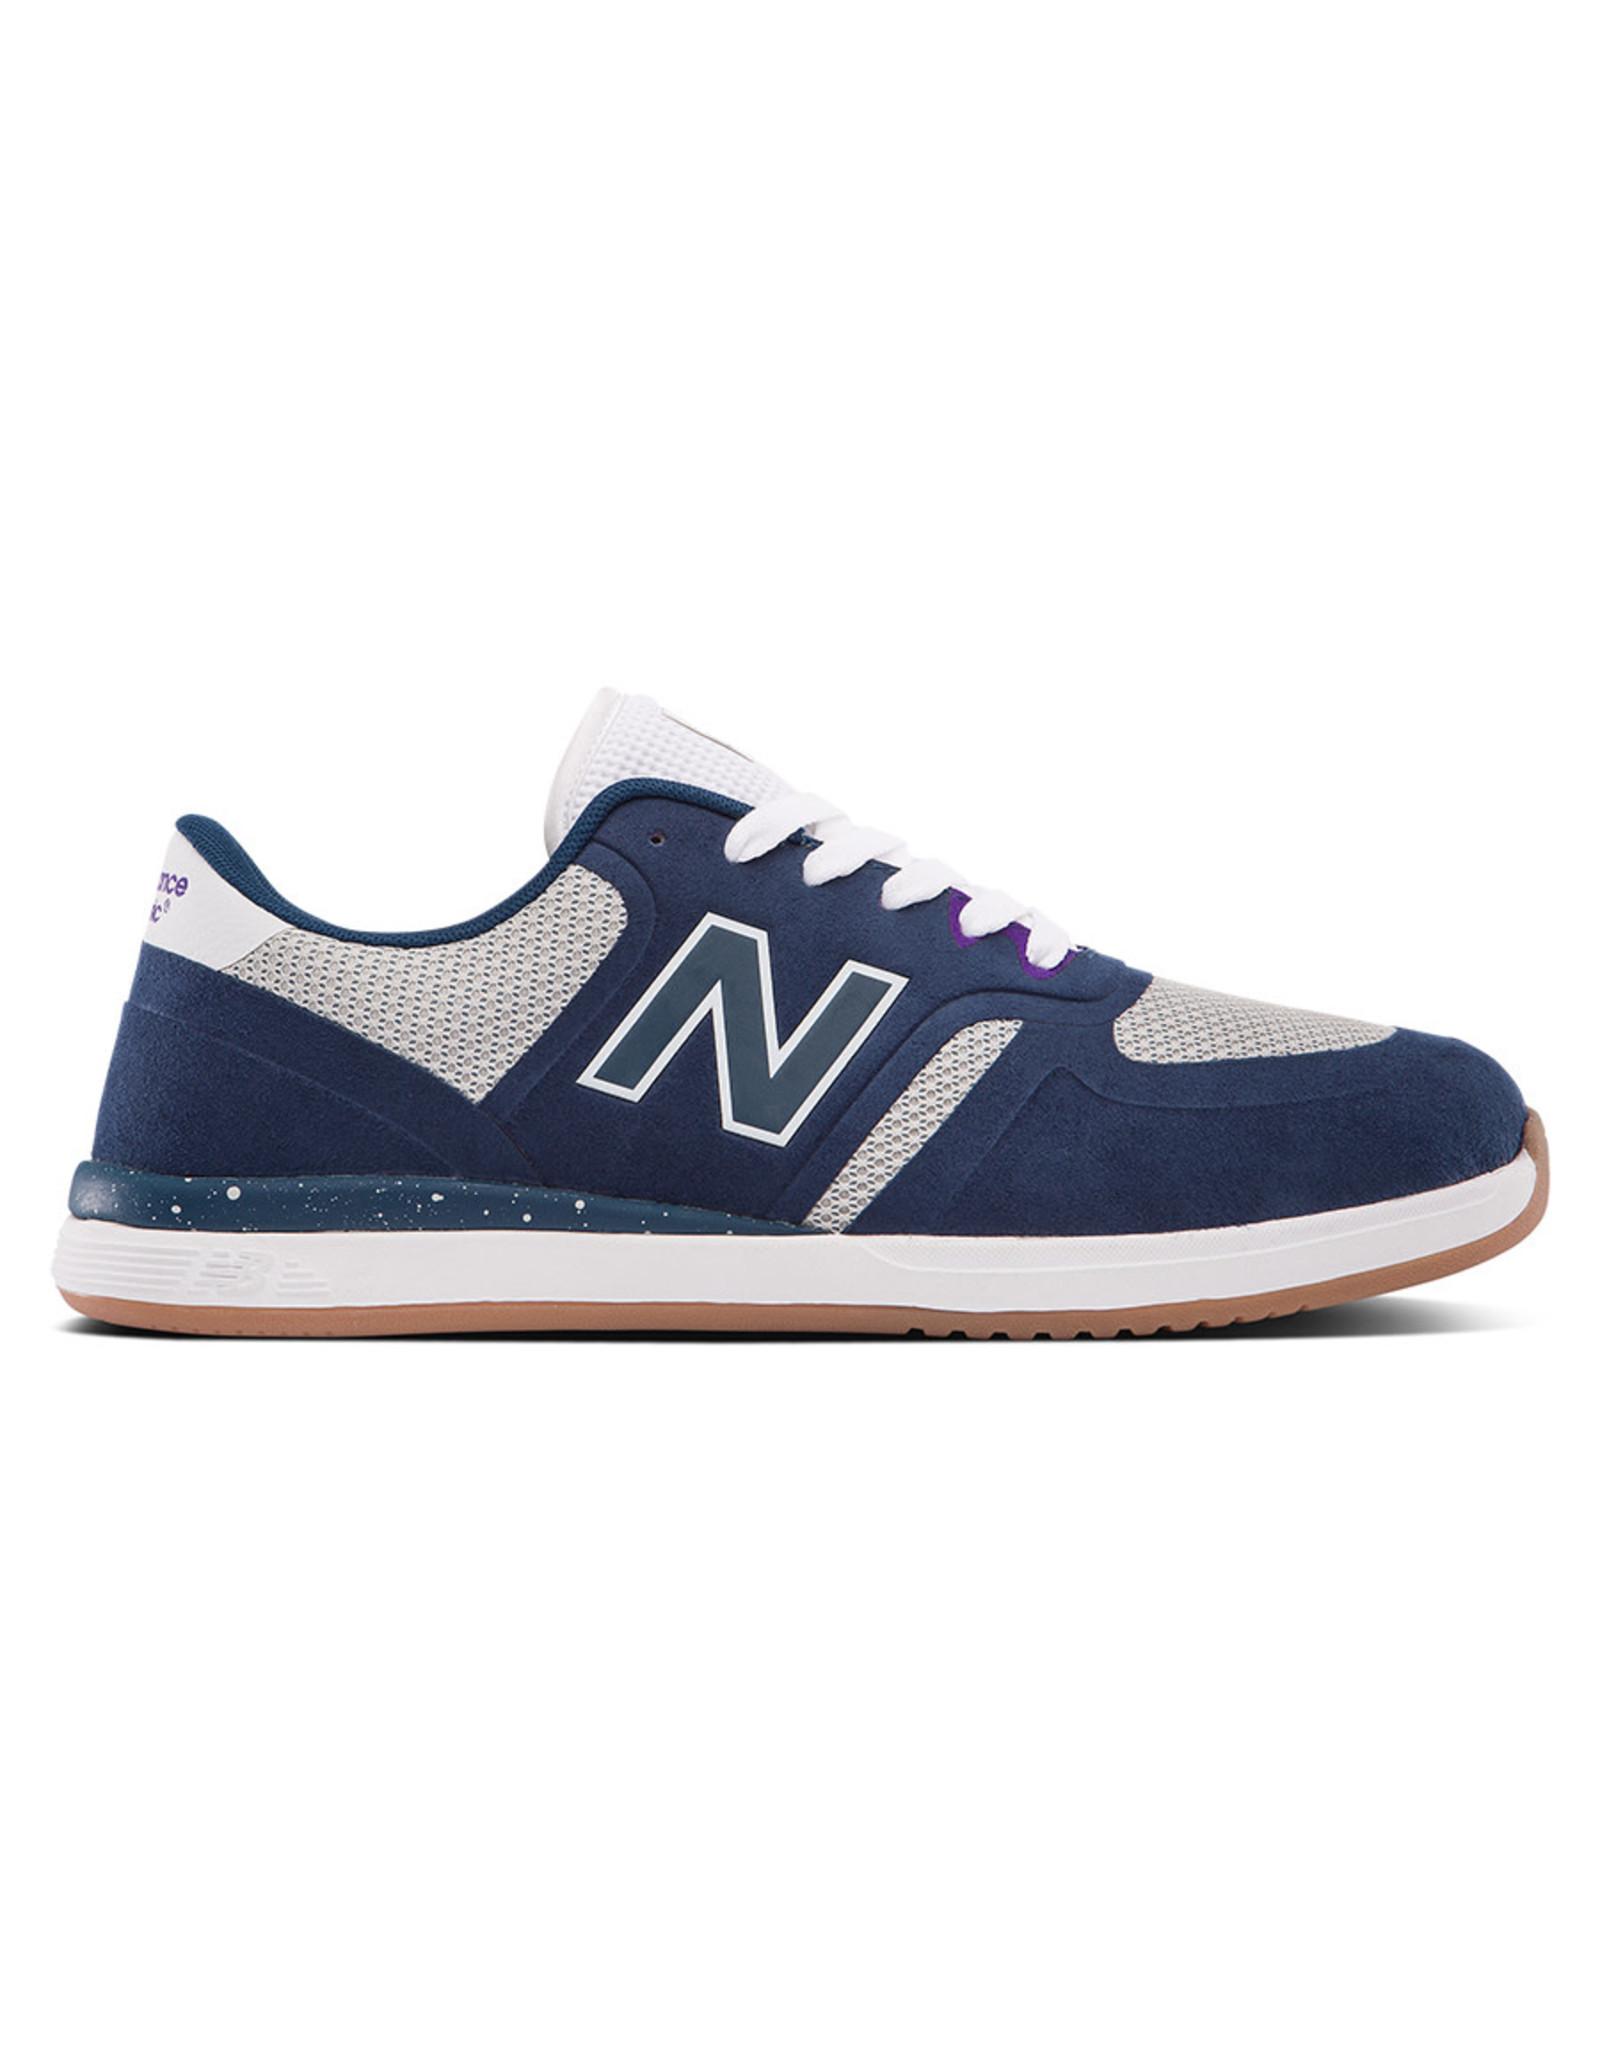 New Balance Numeric New Balance Numeric Shoe 420 (Blue/Grey/Gum)